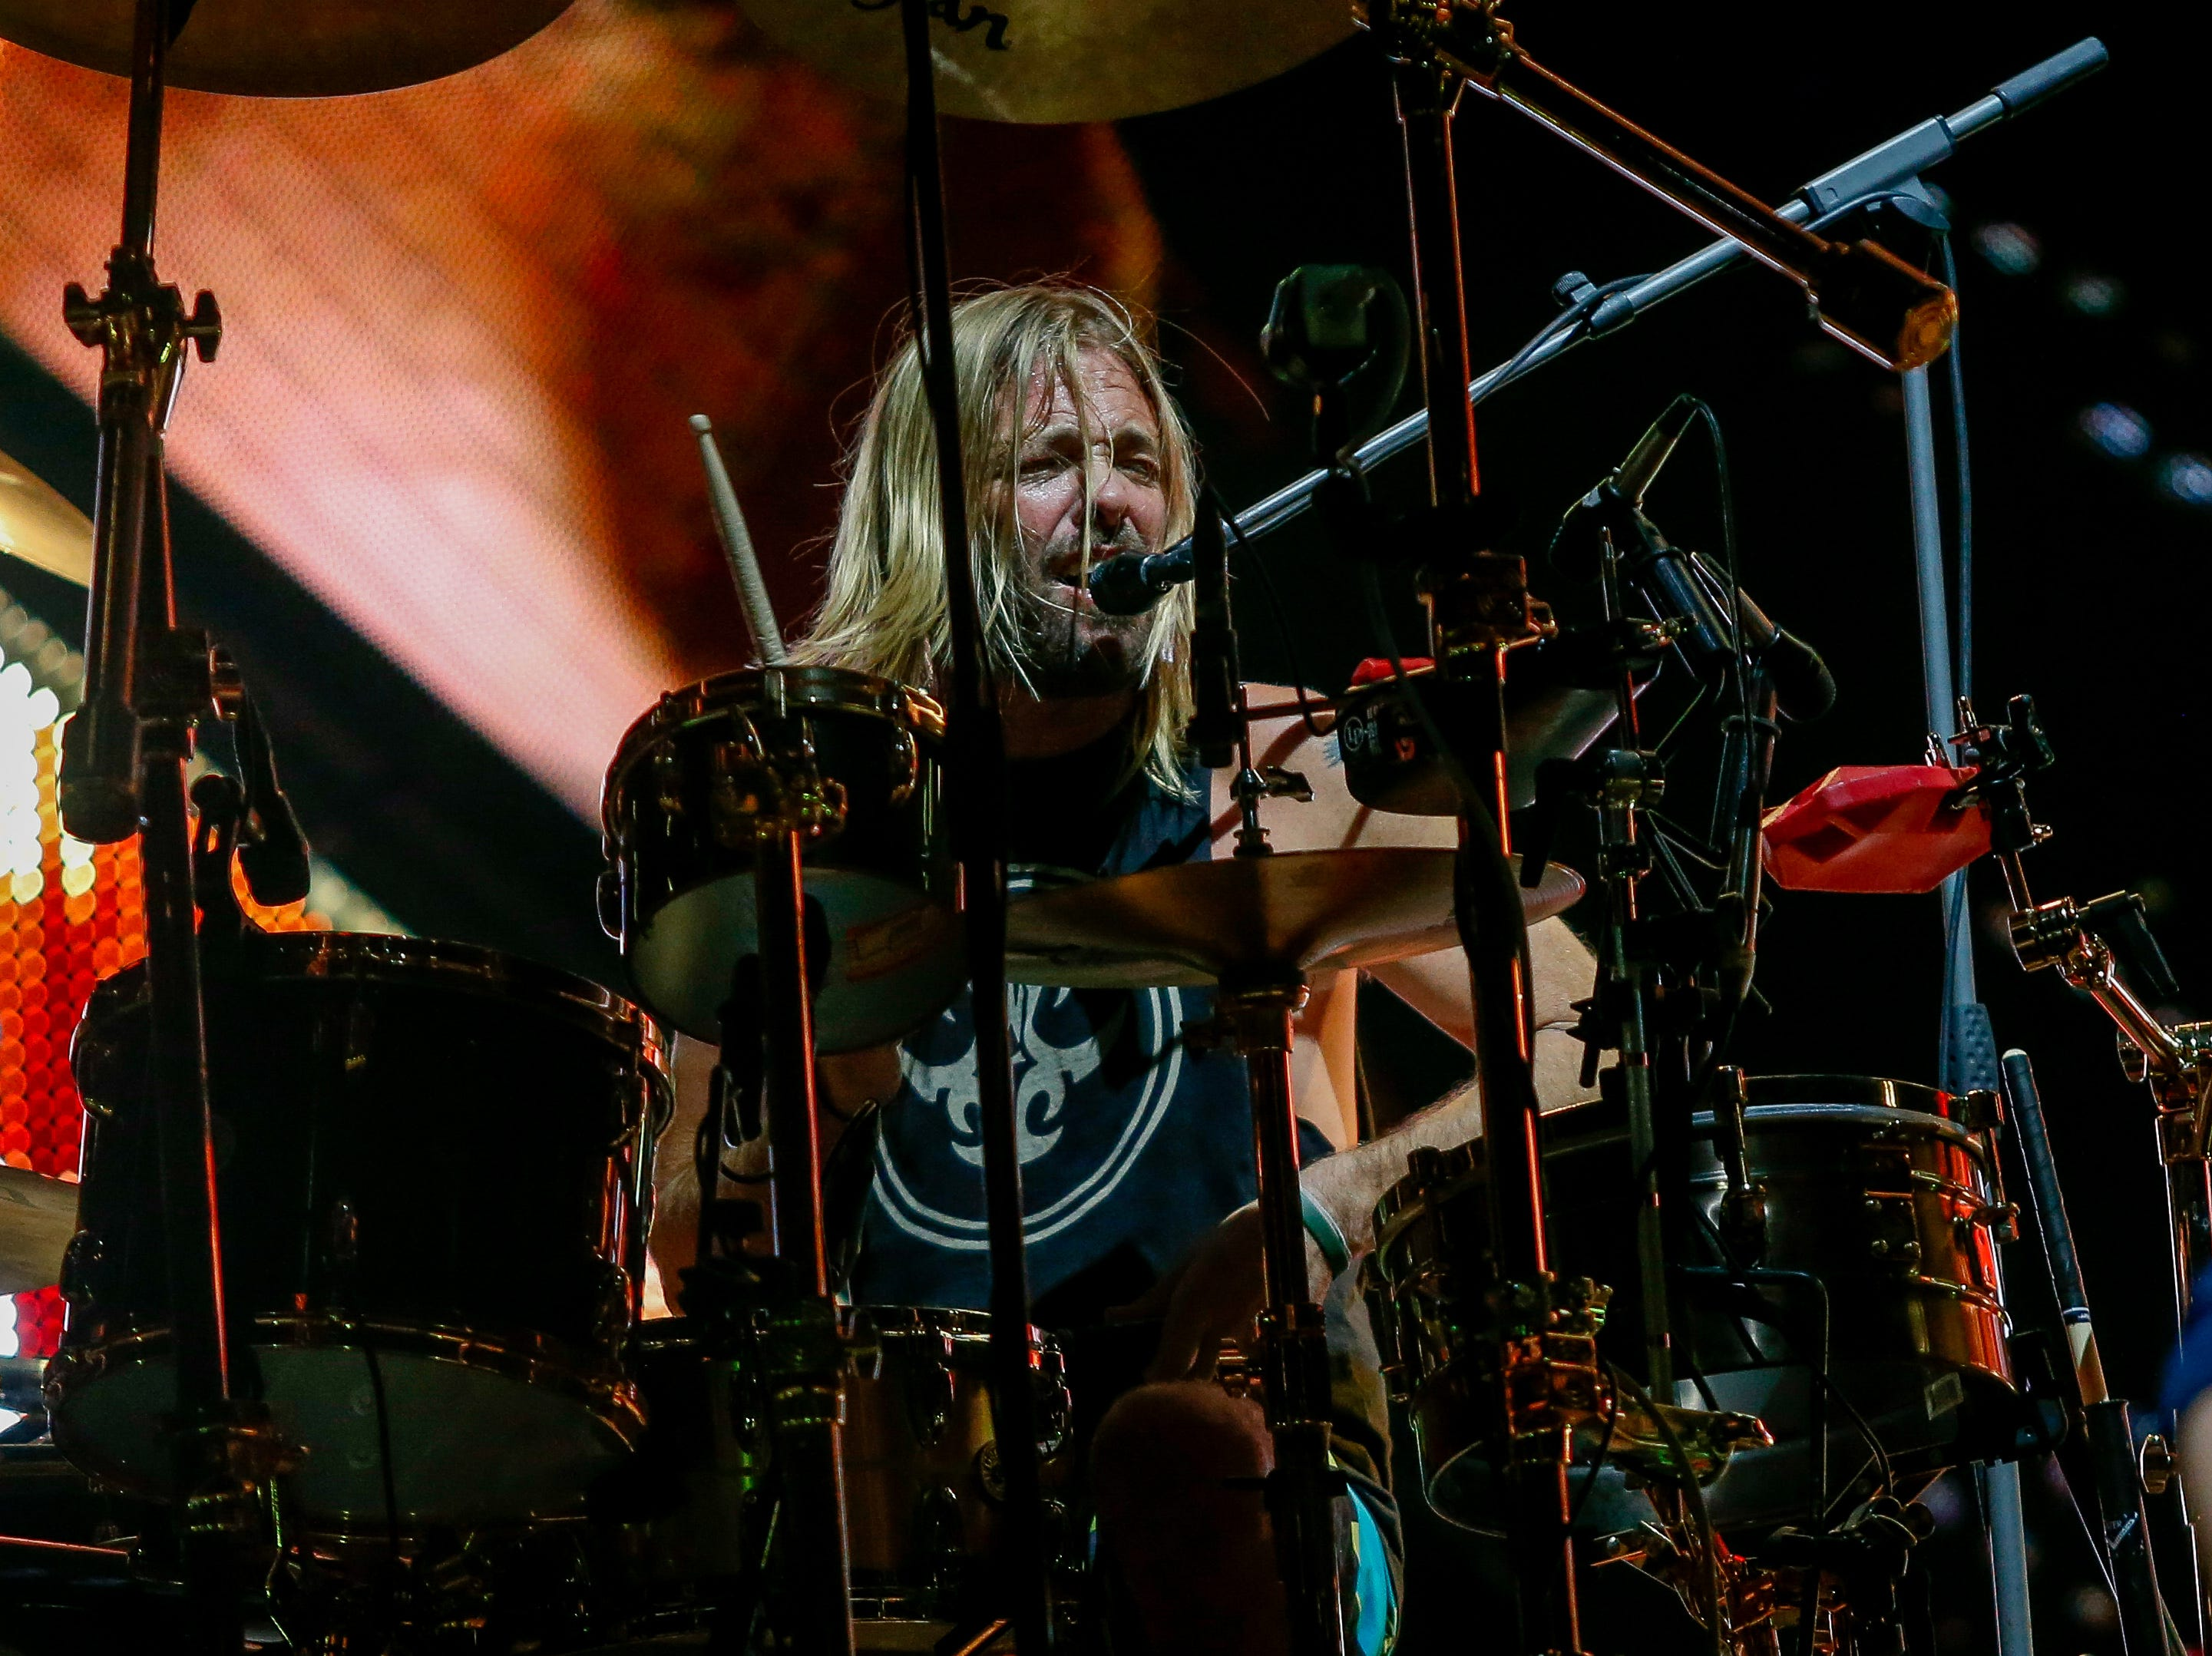 Drummer Taylor Hawkins adds backing vocals during Monday's concert at Little Caesars Arena.